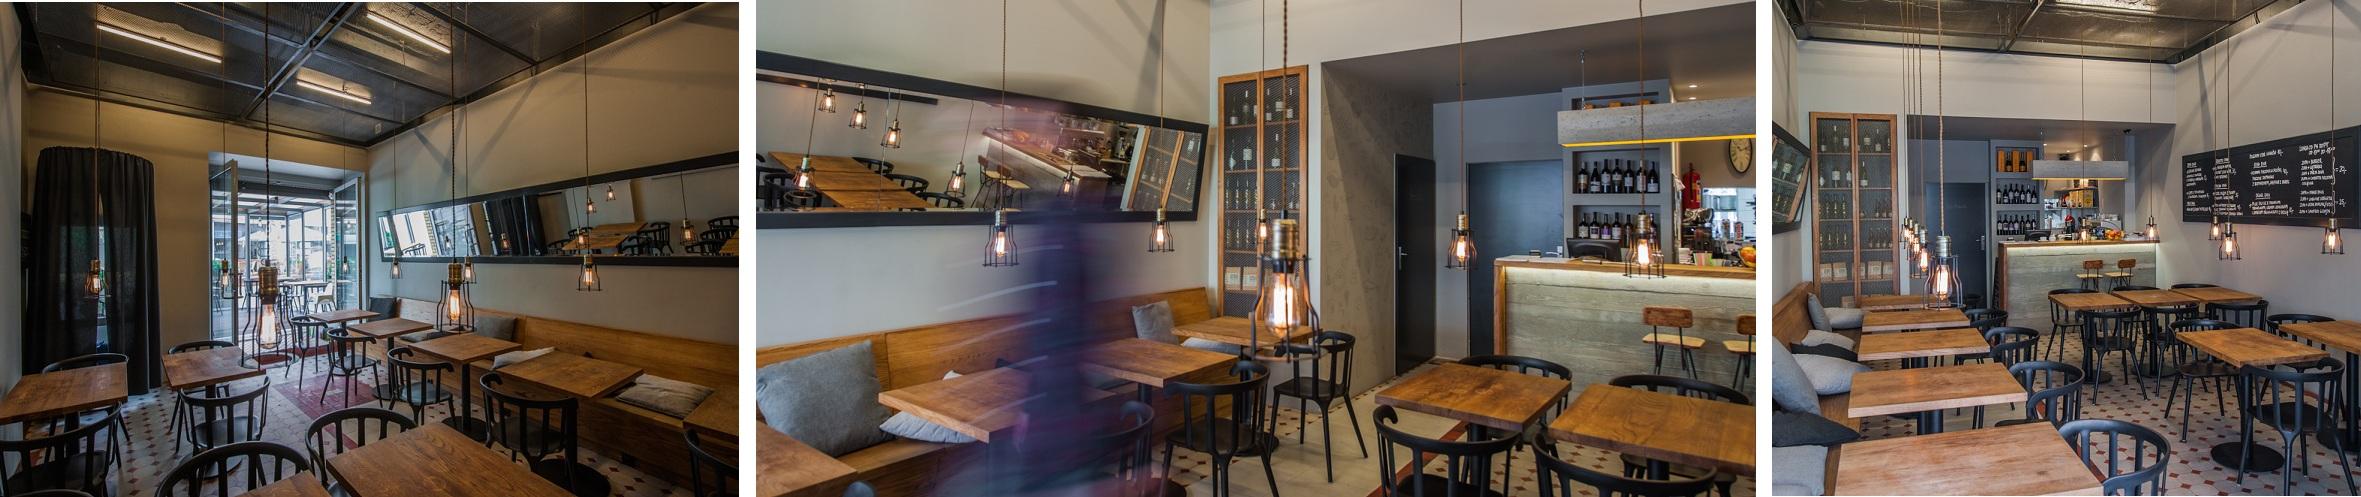 Manana Bistro & Wine Bar (fot. materiały prasowe)